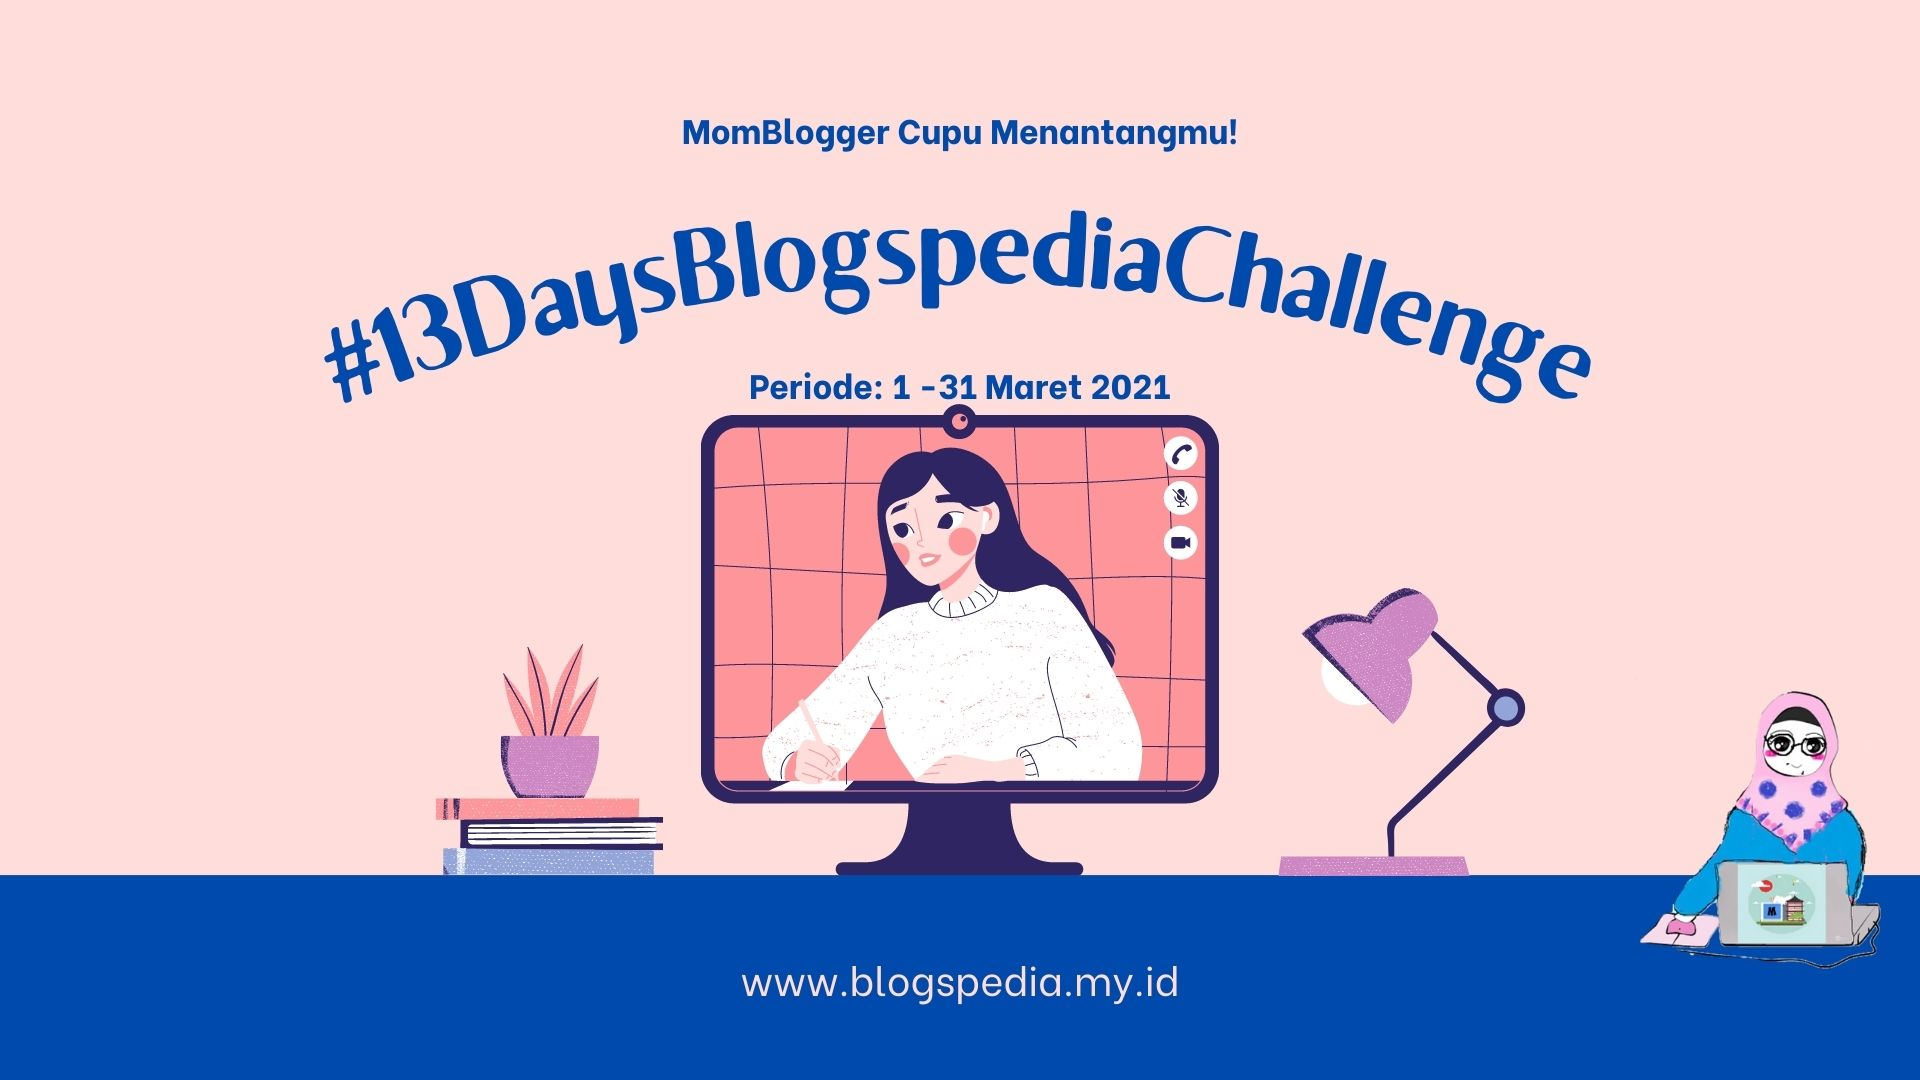 13 Days Blogspedia Challenge